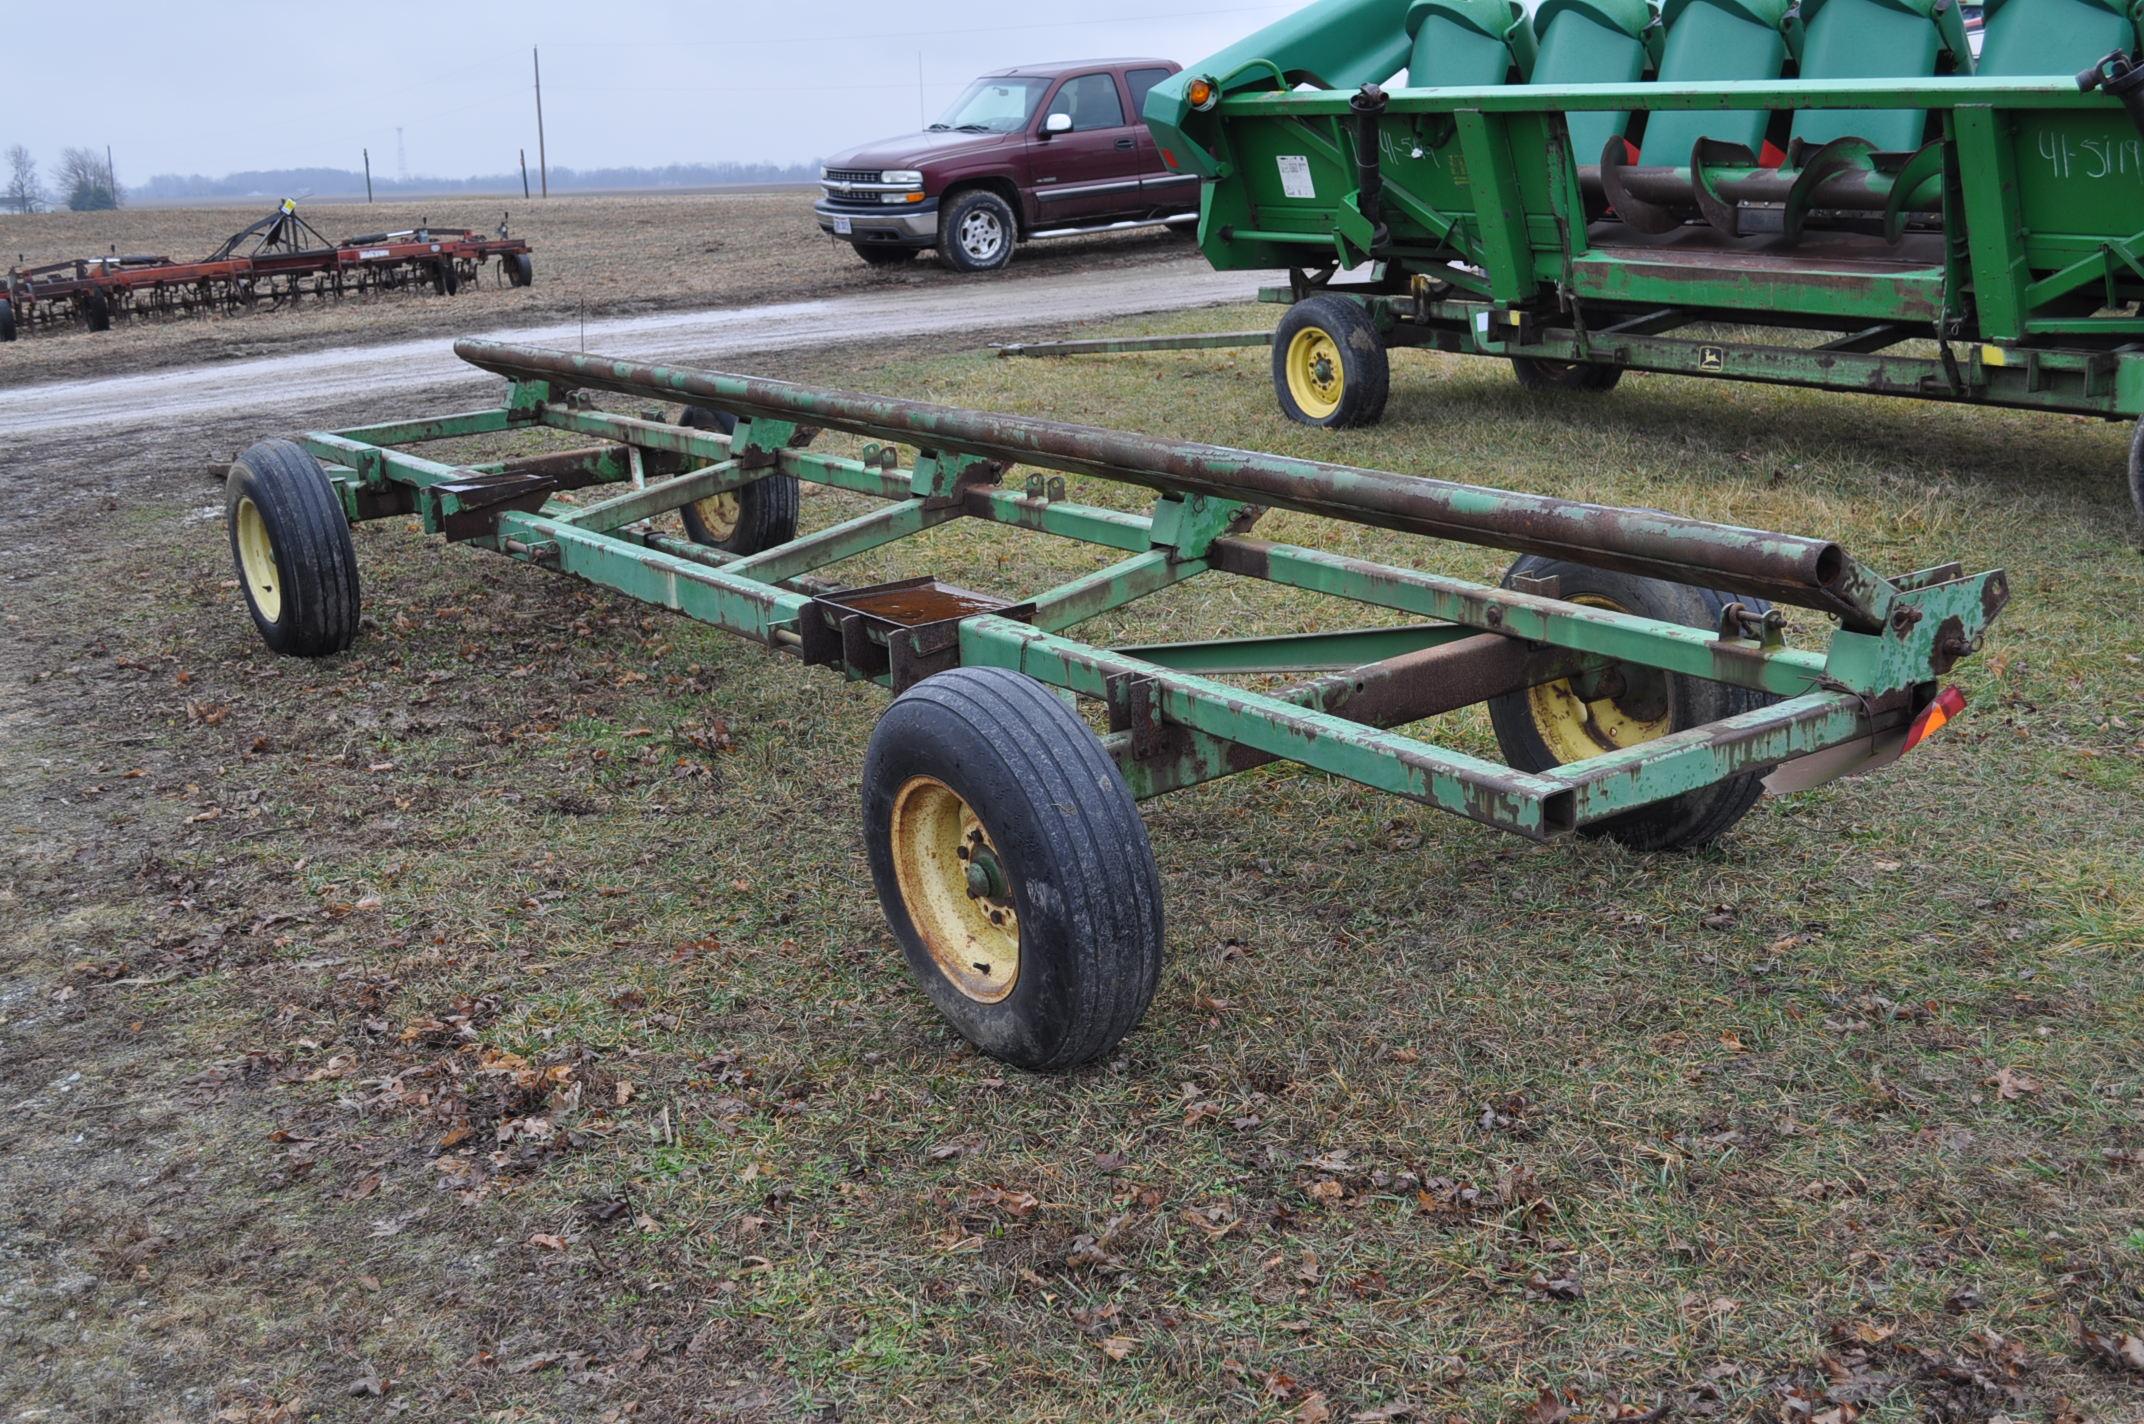 20' John Deere header wagon, 9.5 L-15 tires - Image 3 of 5